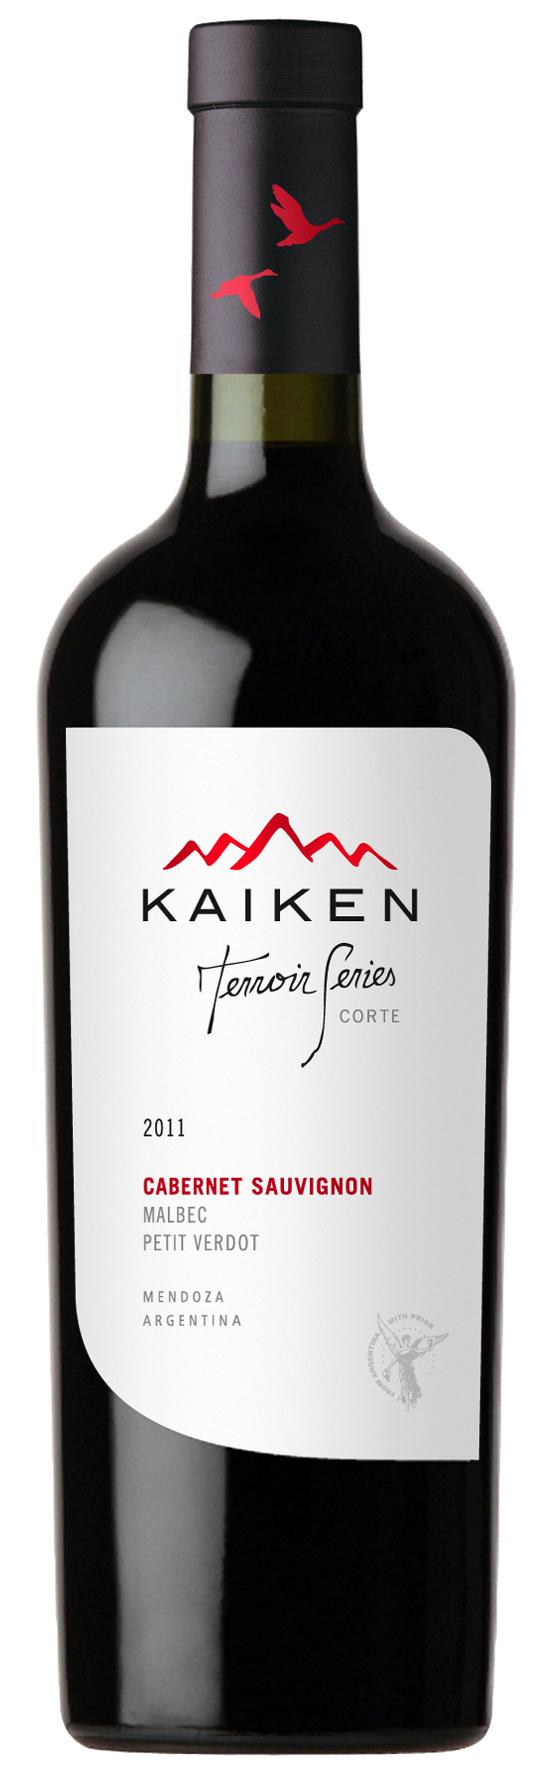 K2015 aiken Terroir Series Corte Cabernet Sauvignon